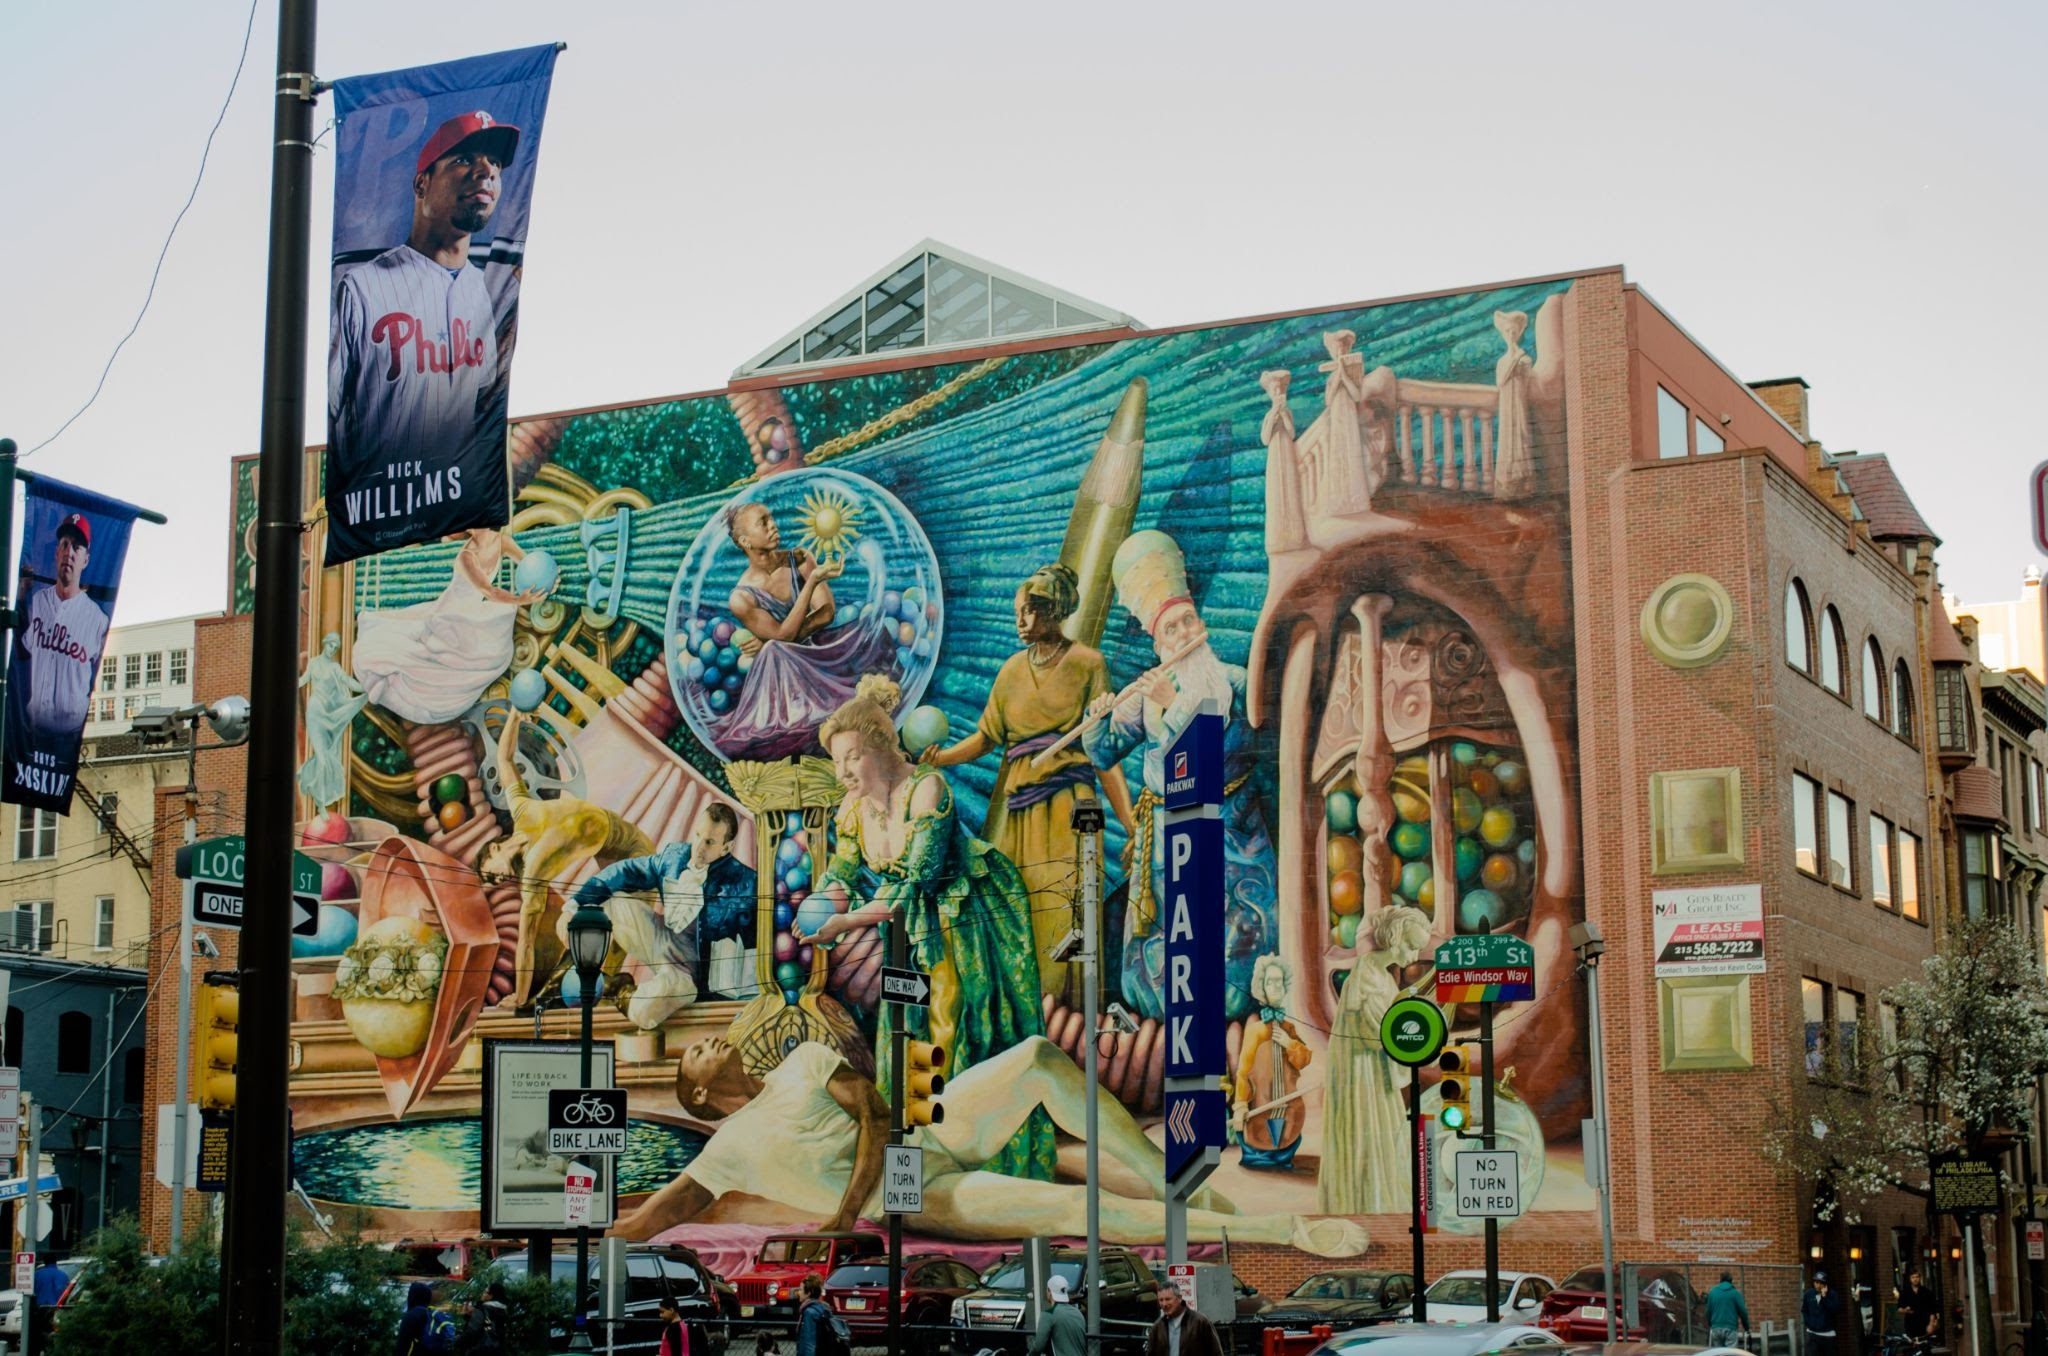 mural arts philadelphia, Philadelphia Muses by Meg Saligman